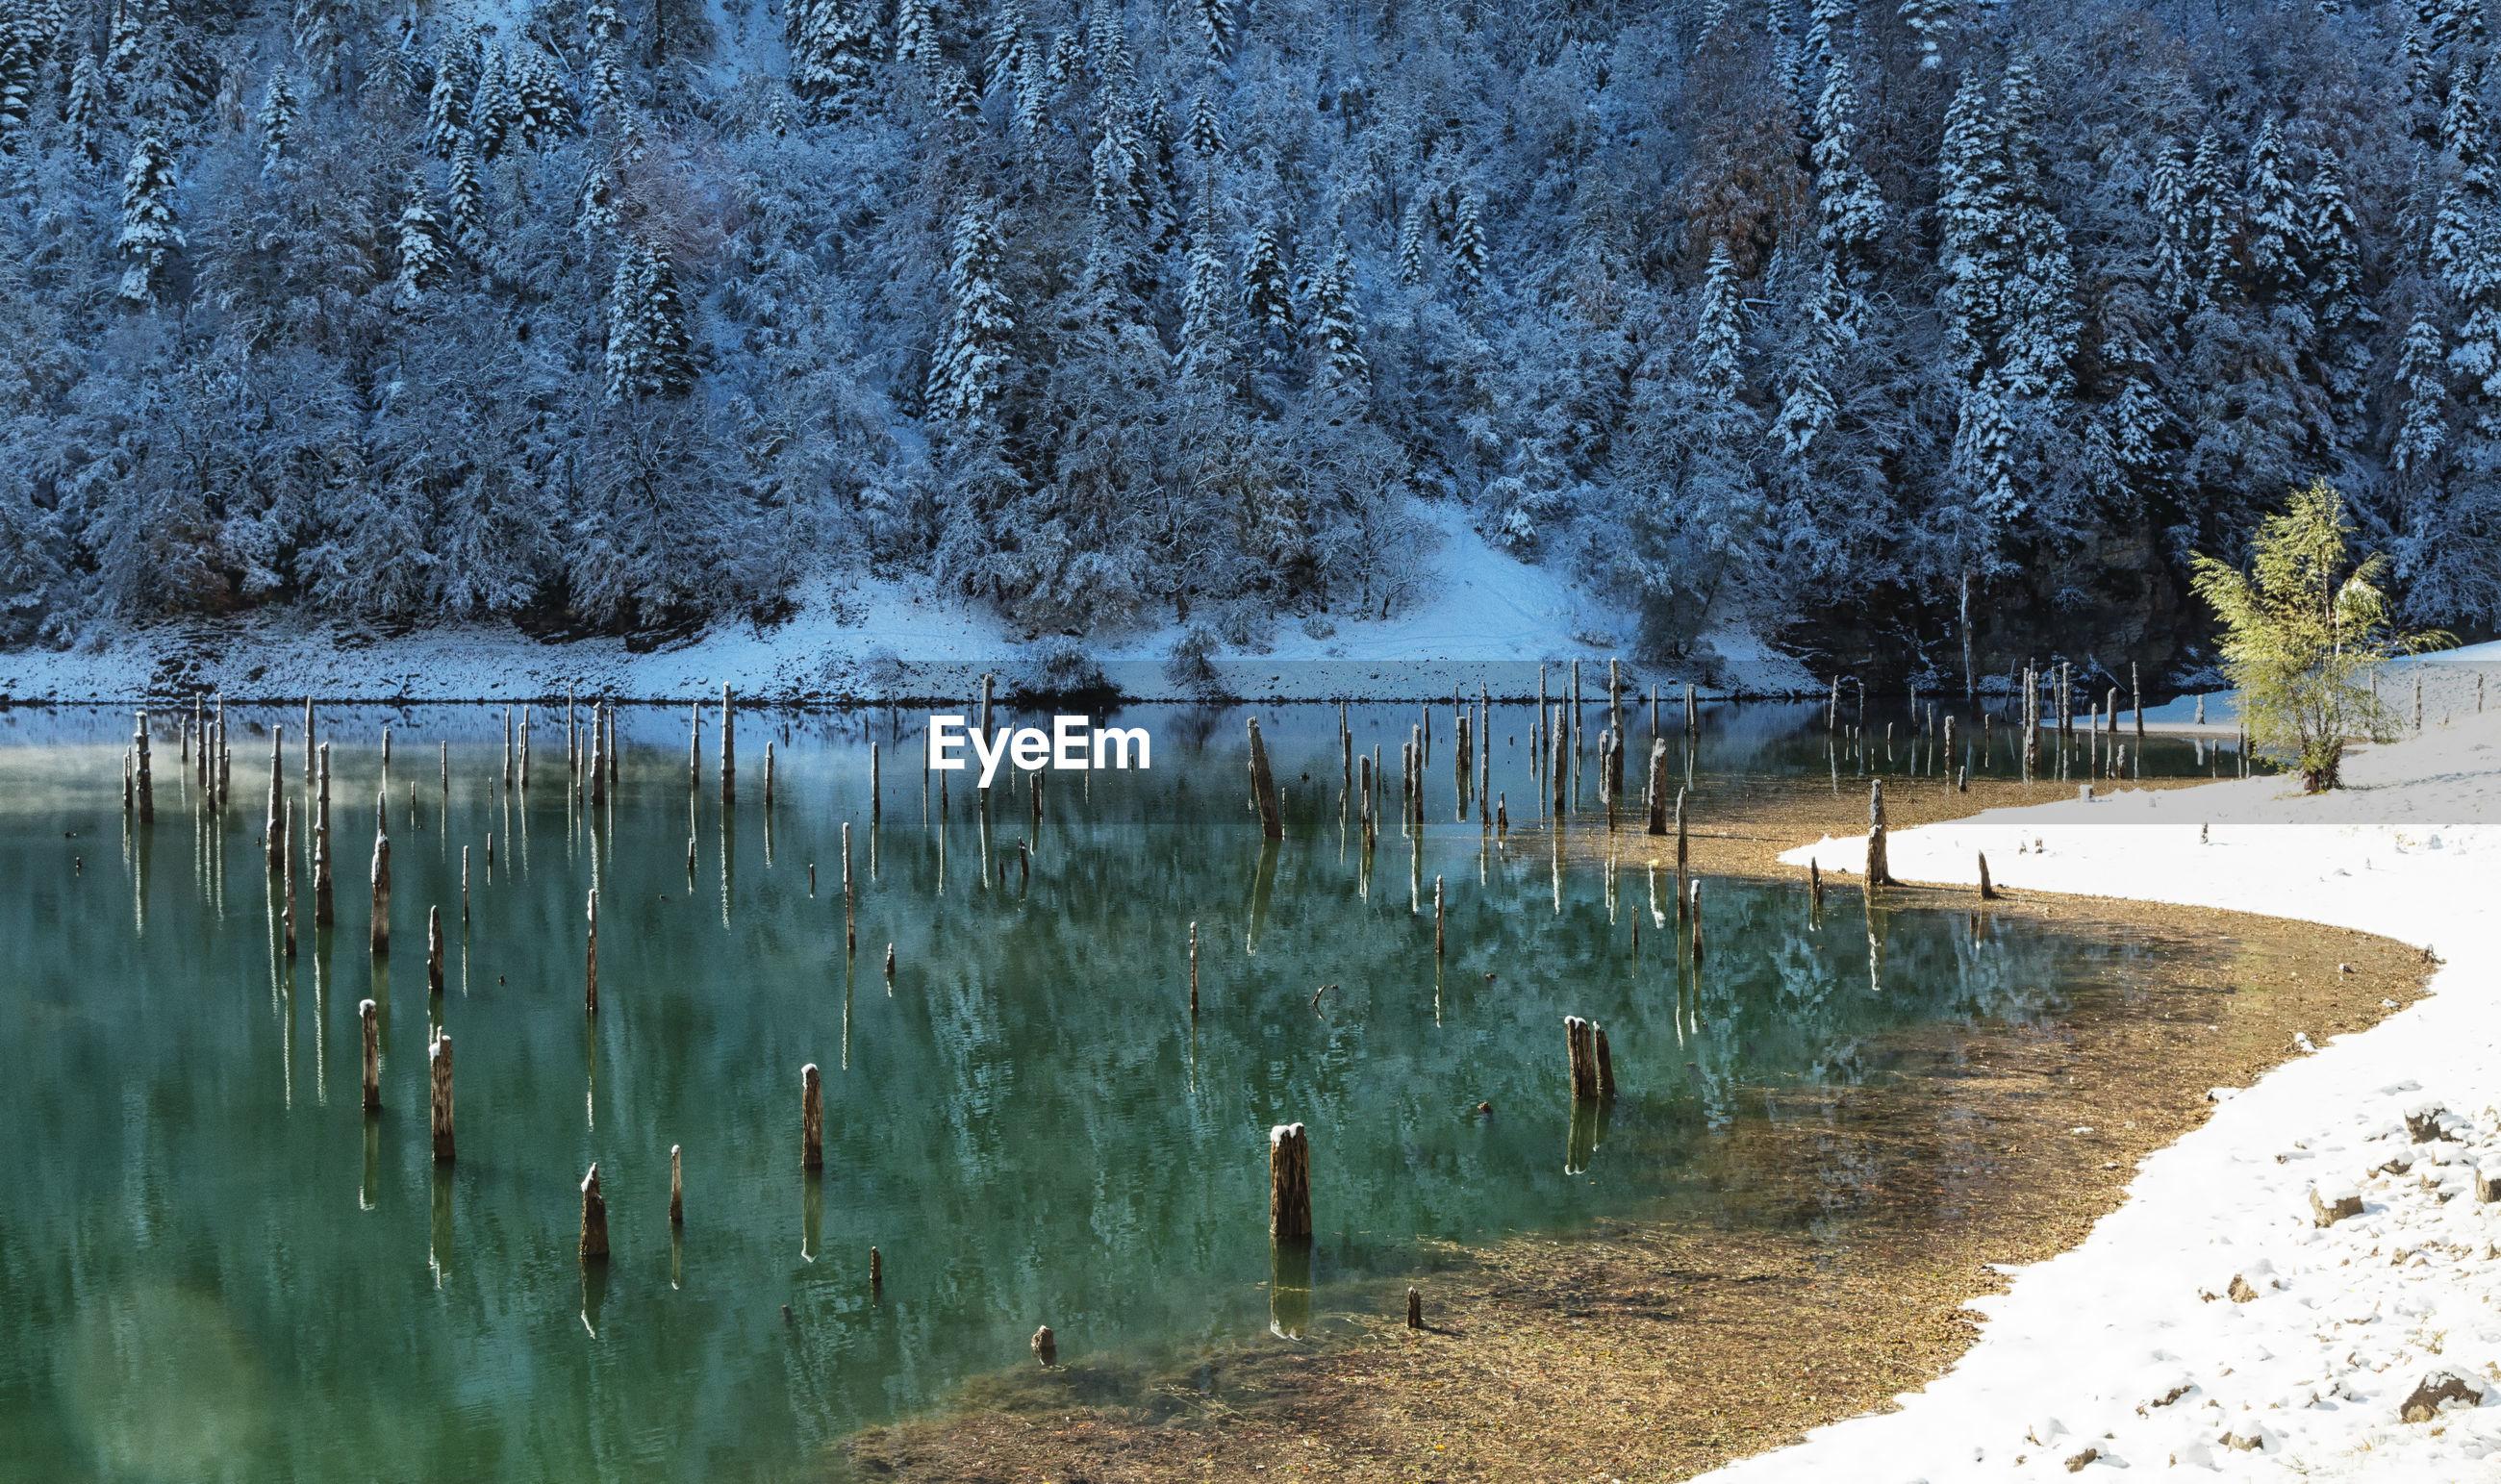 PANORAMIC VIEW OF LAKE IN WINTER